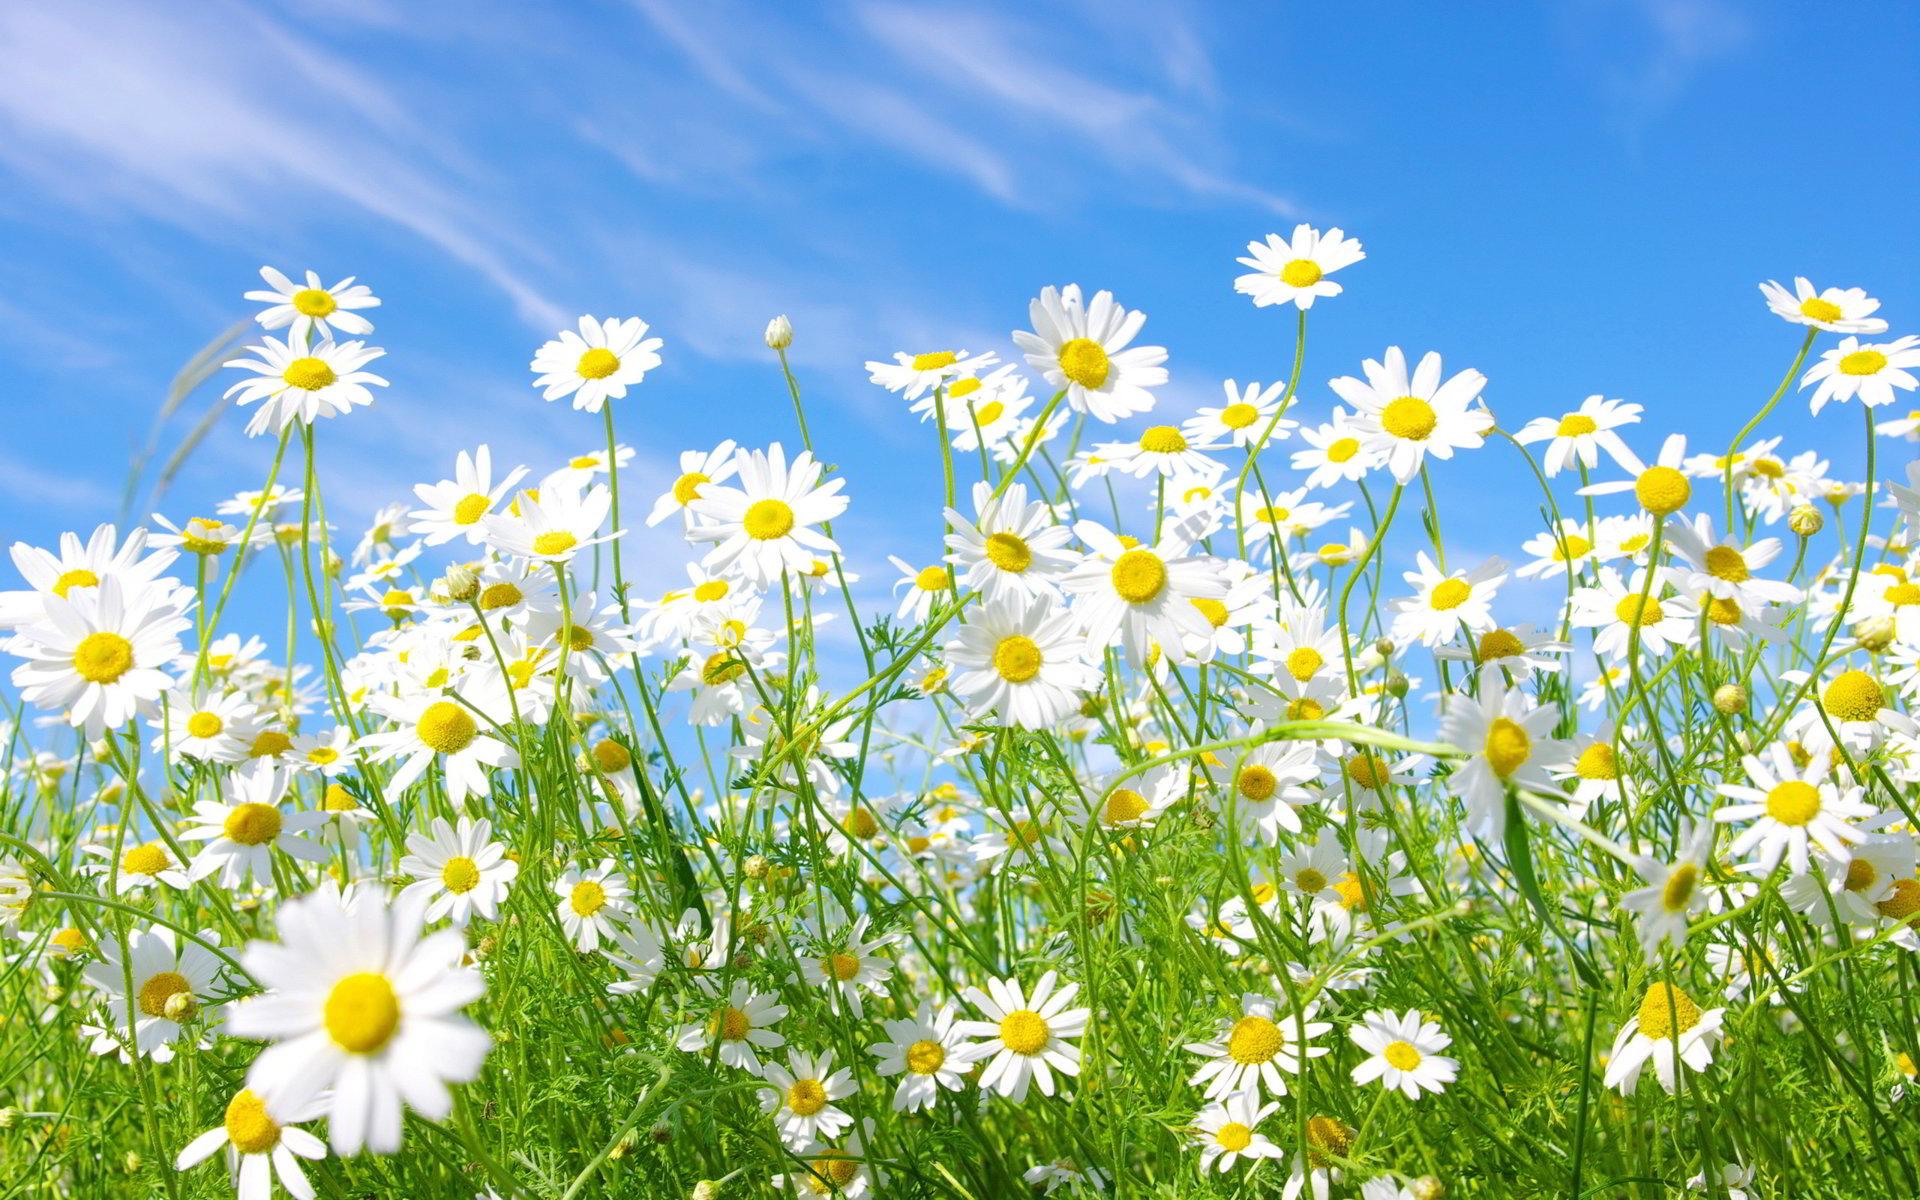 hinh anh hoa cuc dep 6